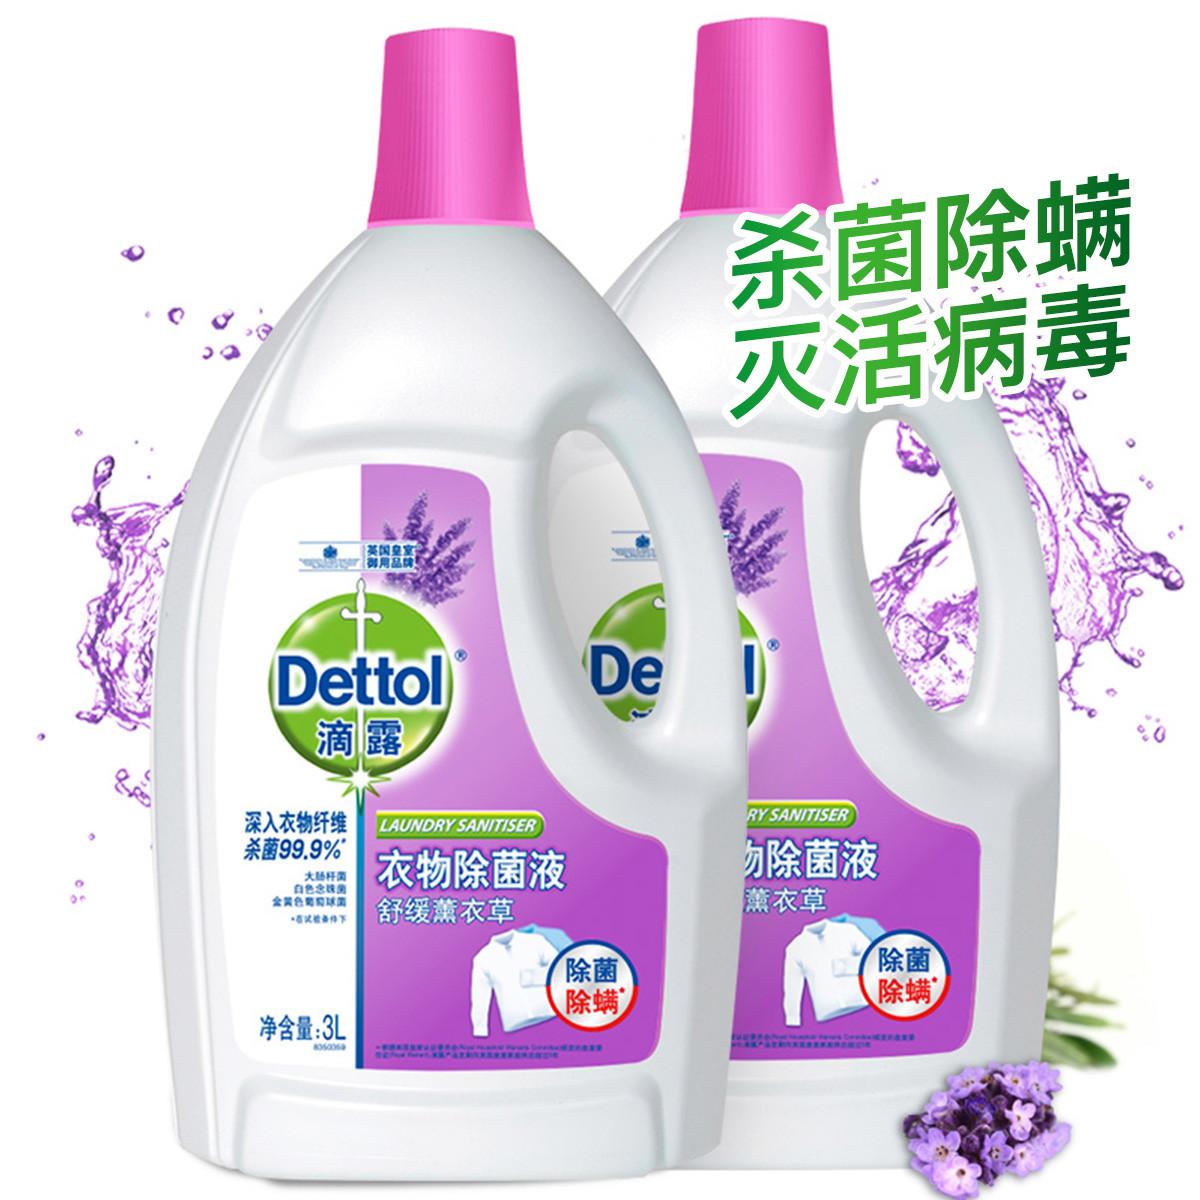 Dettol 【杀菌100种】滴露衣物除菌液3L*2 为衣物消毒设计 家用杀菌除螨